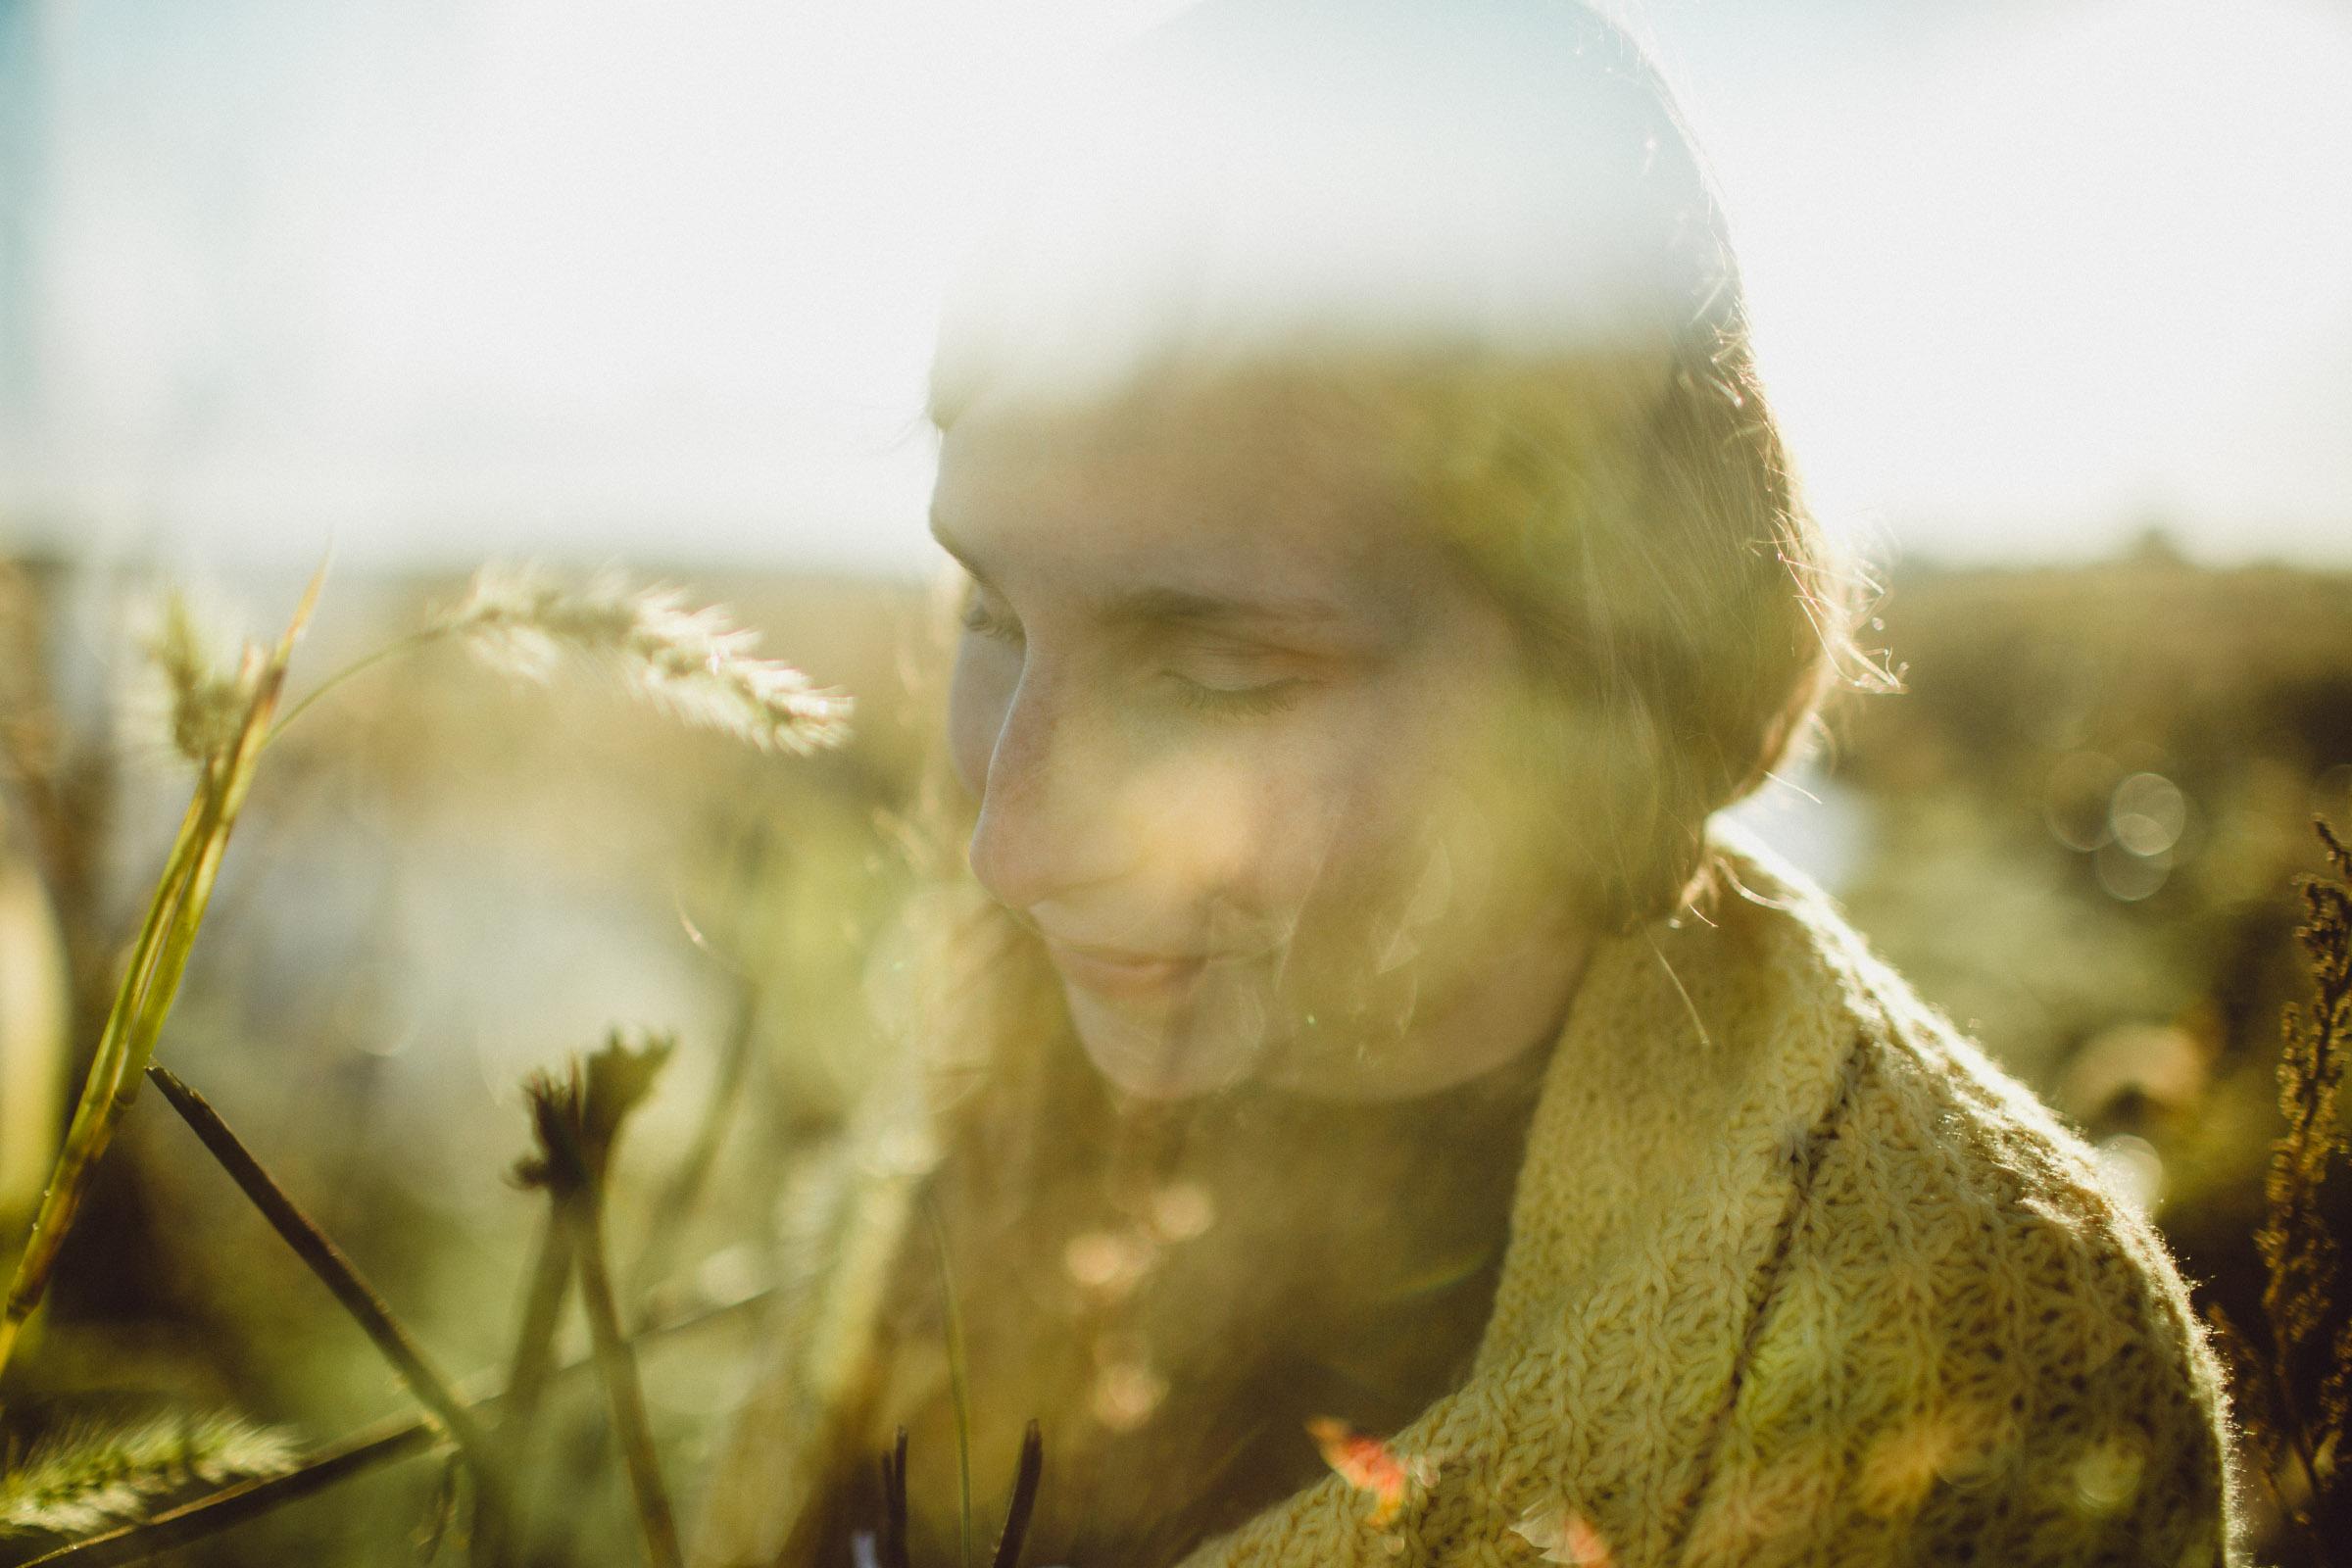 Double Exposure Portrait of girl in field